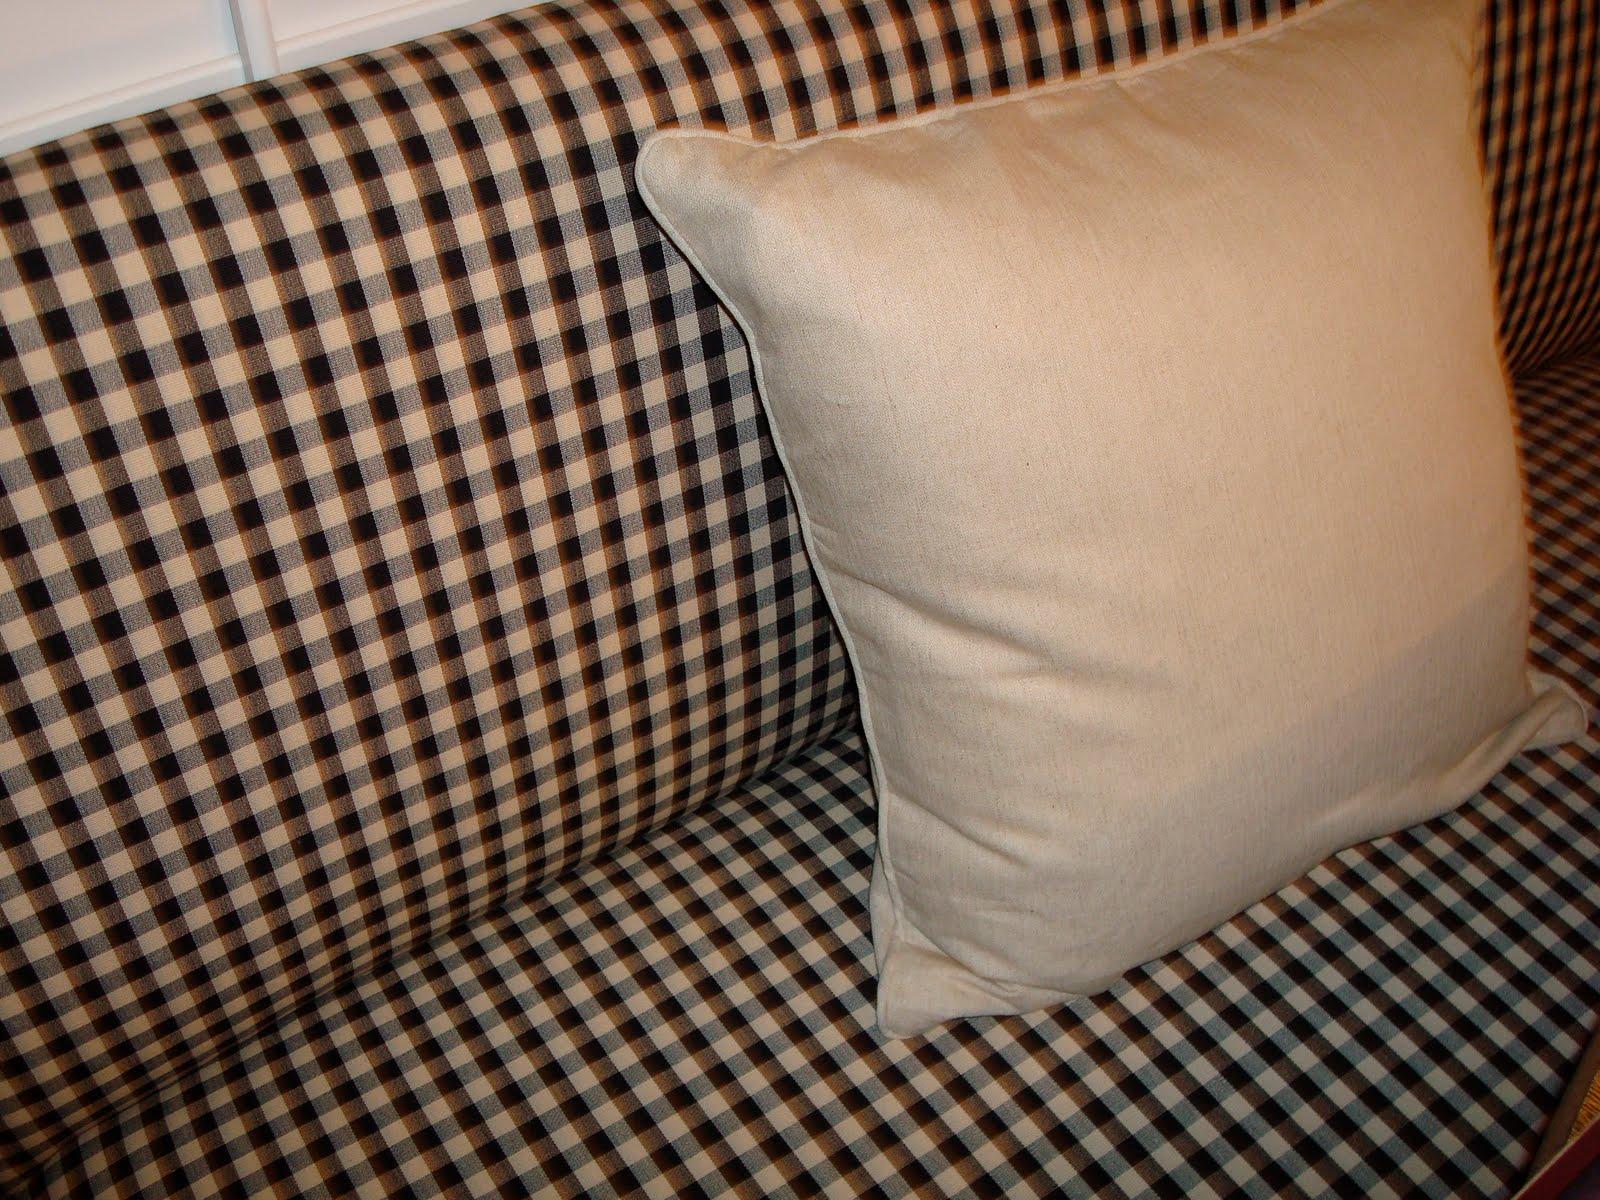 aspirations of a southern housewife ballard designs backroom bonanza ballard designs backroom bonanza